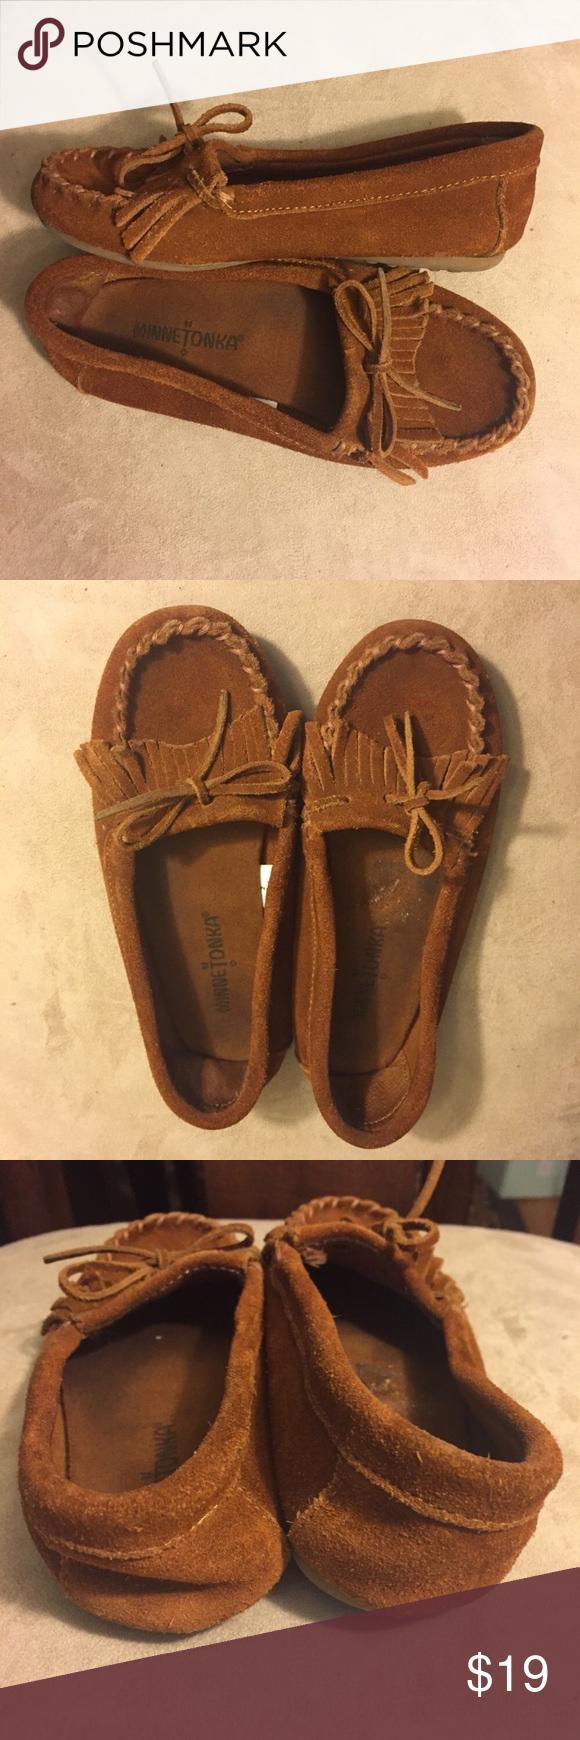 Minnetonka Kilty Suede Moccasin Suede Moccasins Minnetonka Shoes Moccasins